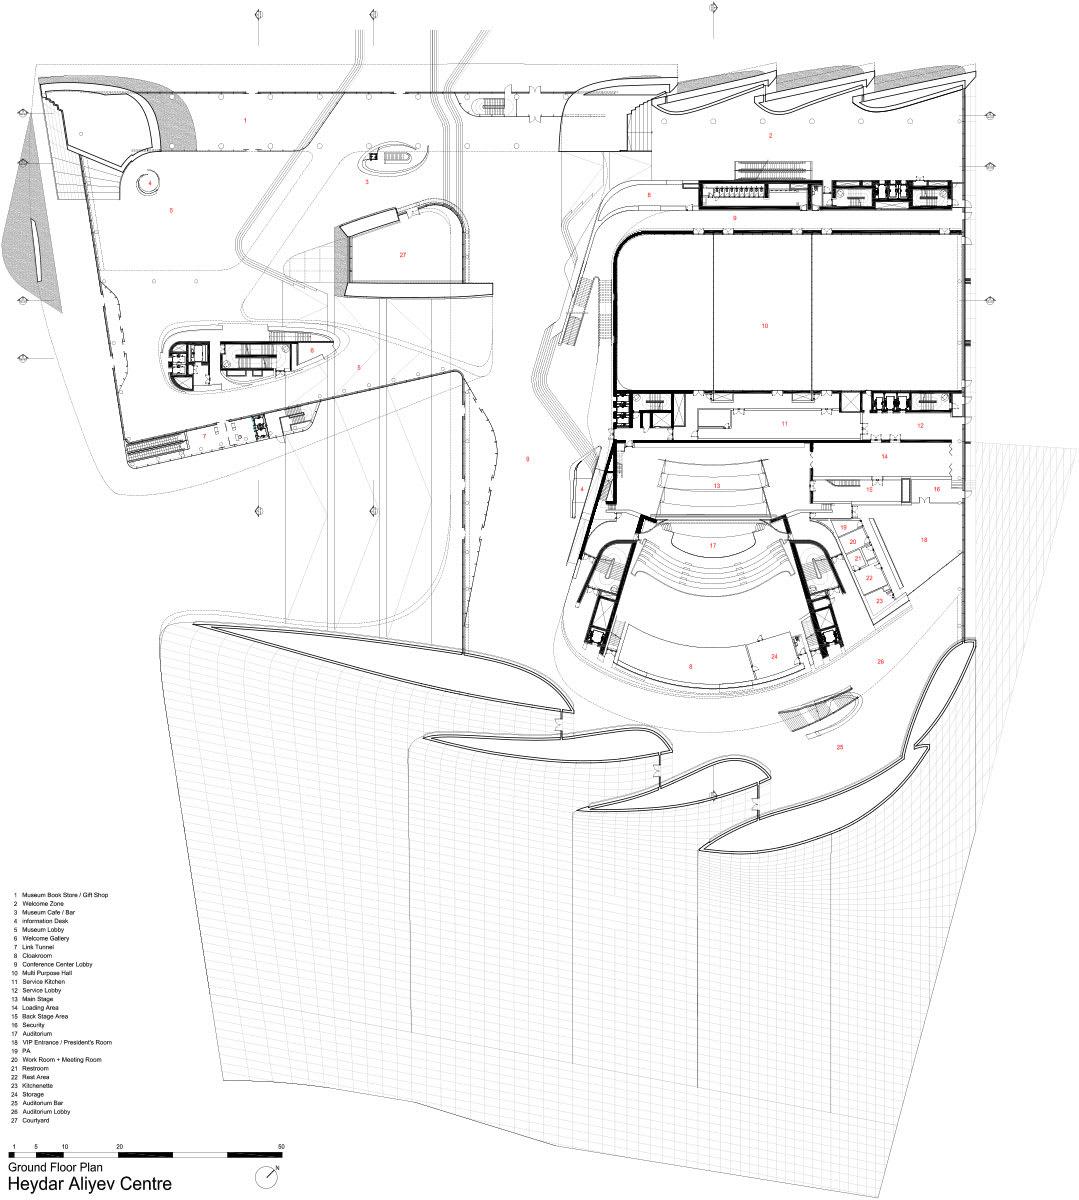 Zaha Hadid Architects Helene Binet Hufton Crow Heydar Aliyev Center Divisare